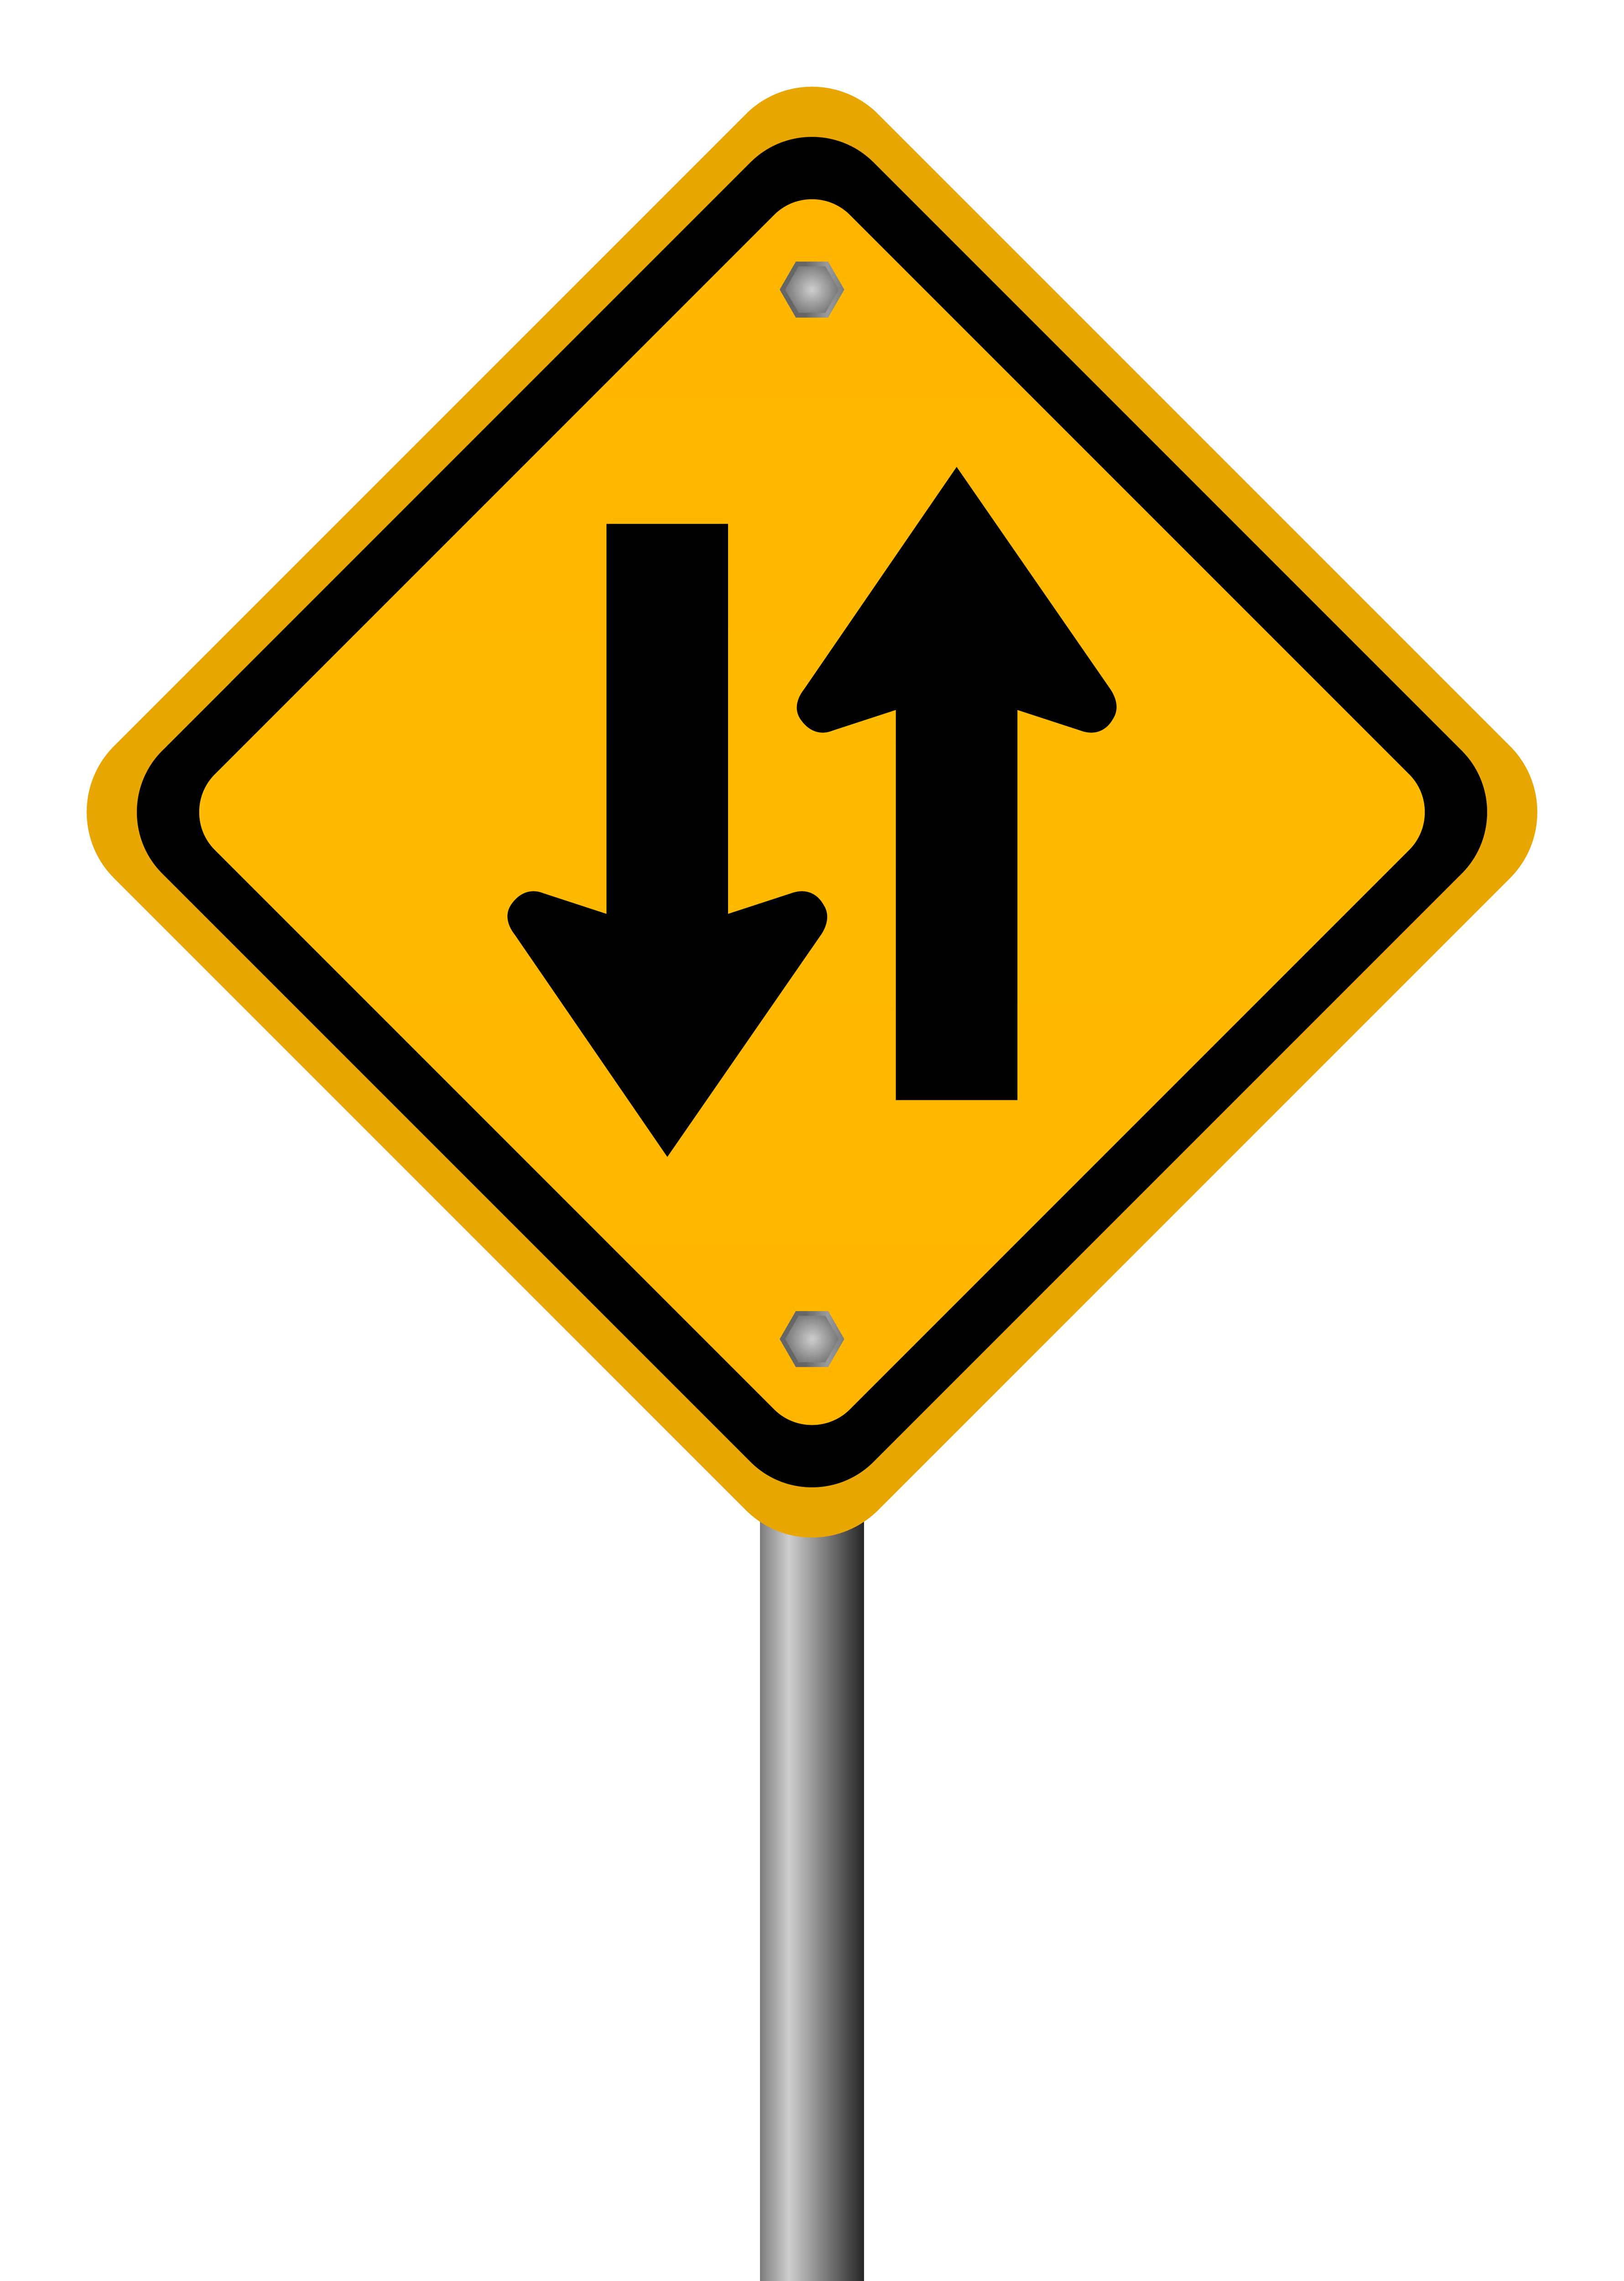 Two Way Arrow Road Sign Boomers Social Media Tutor